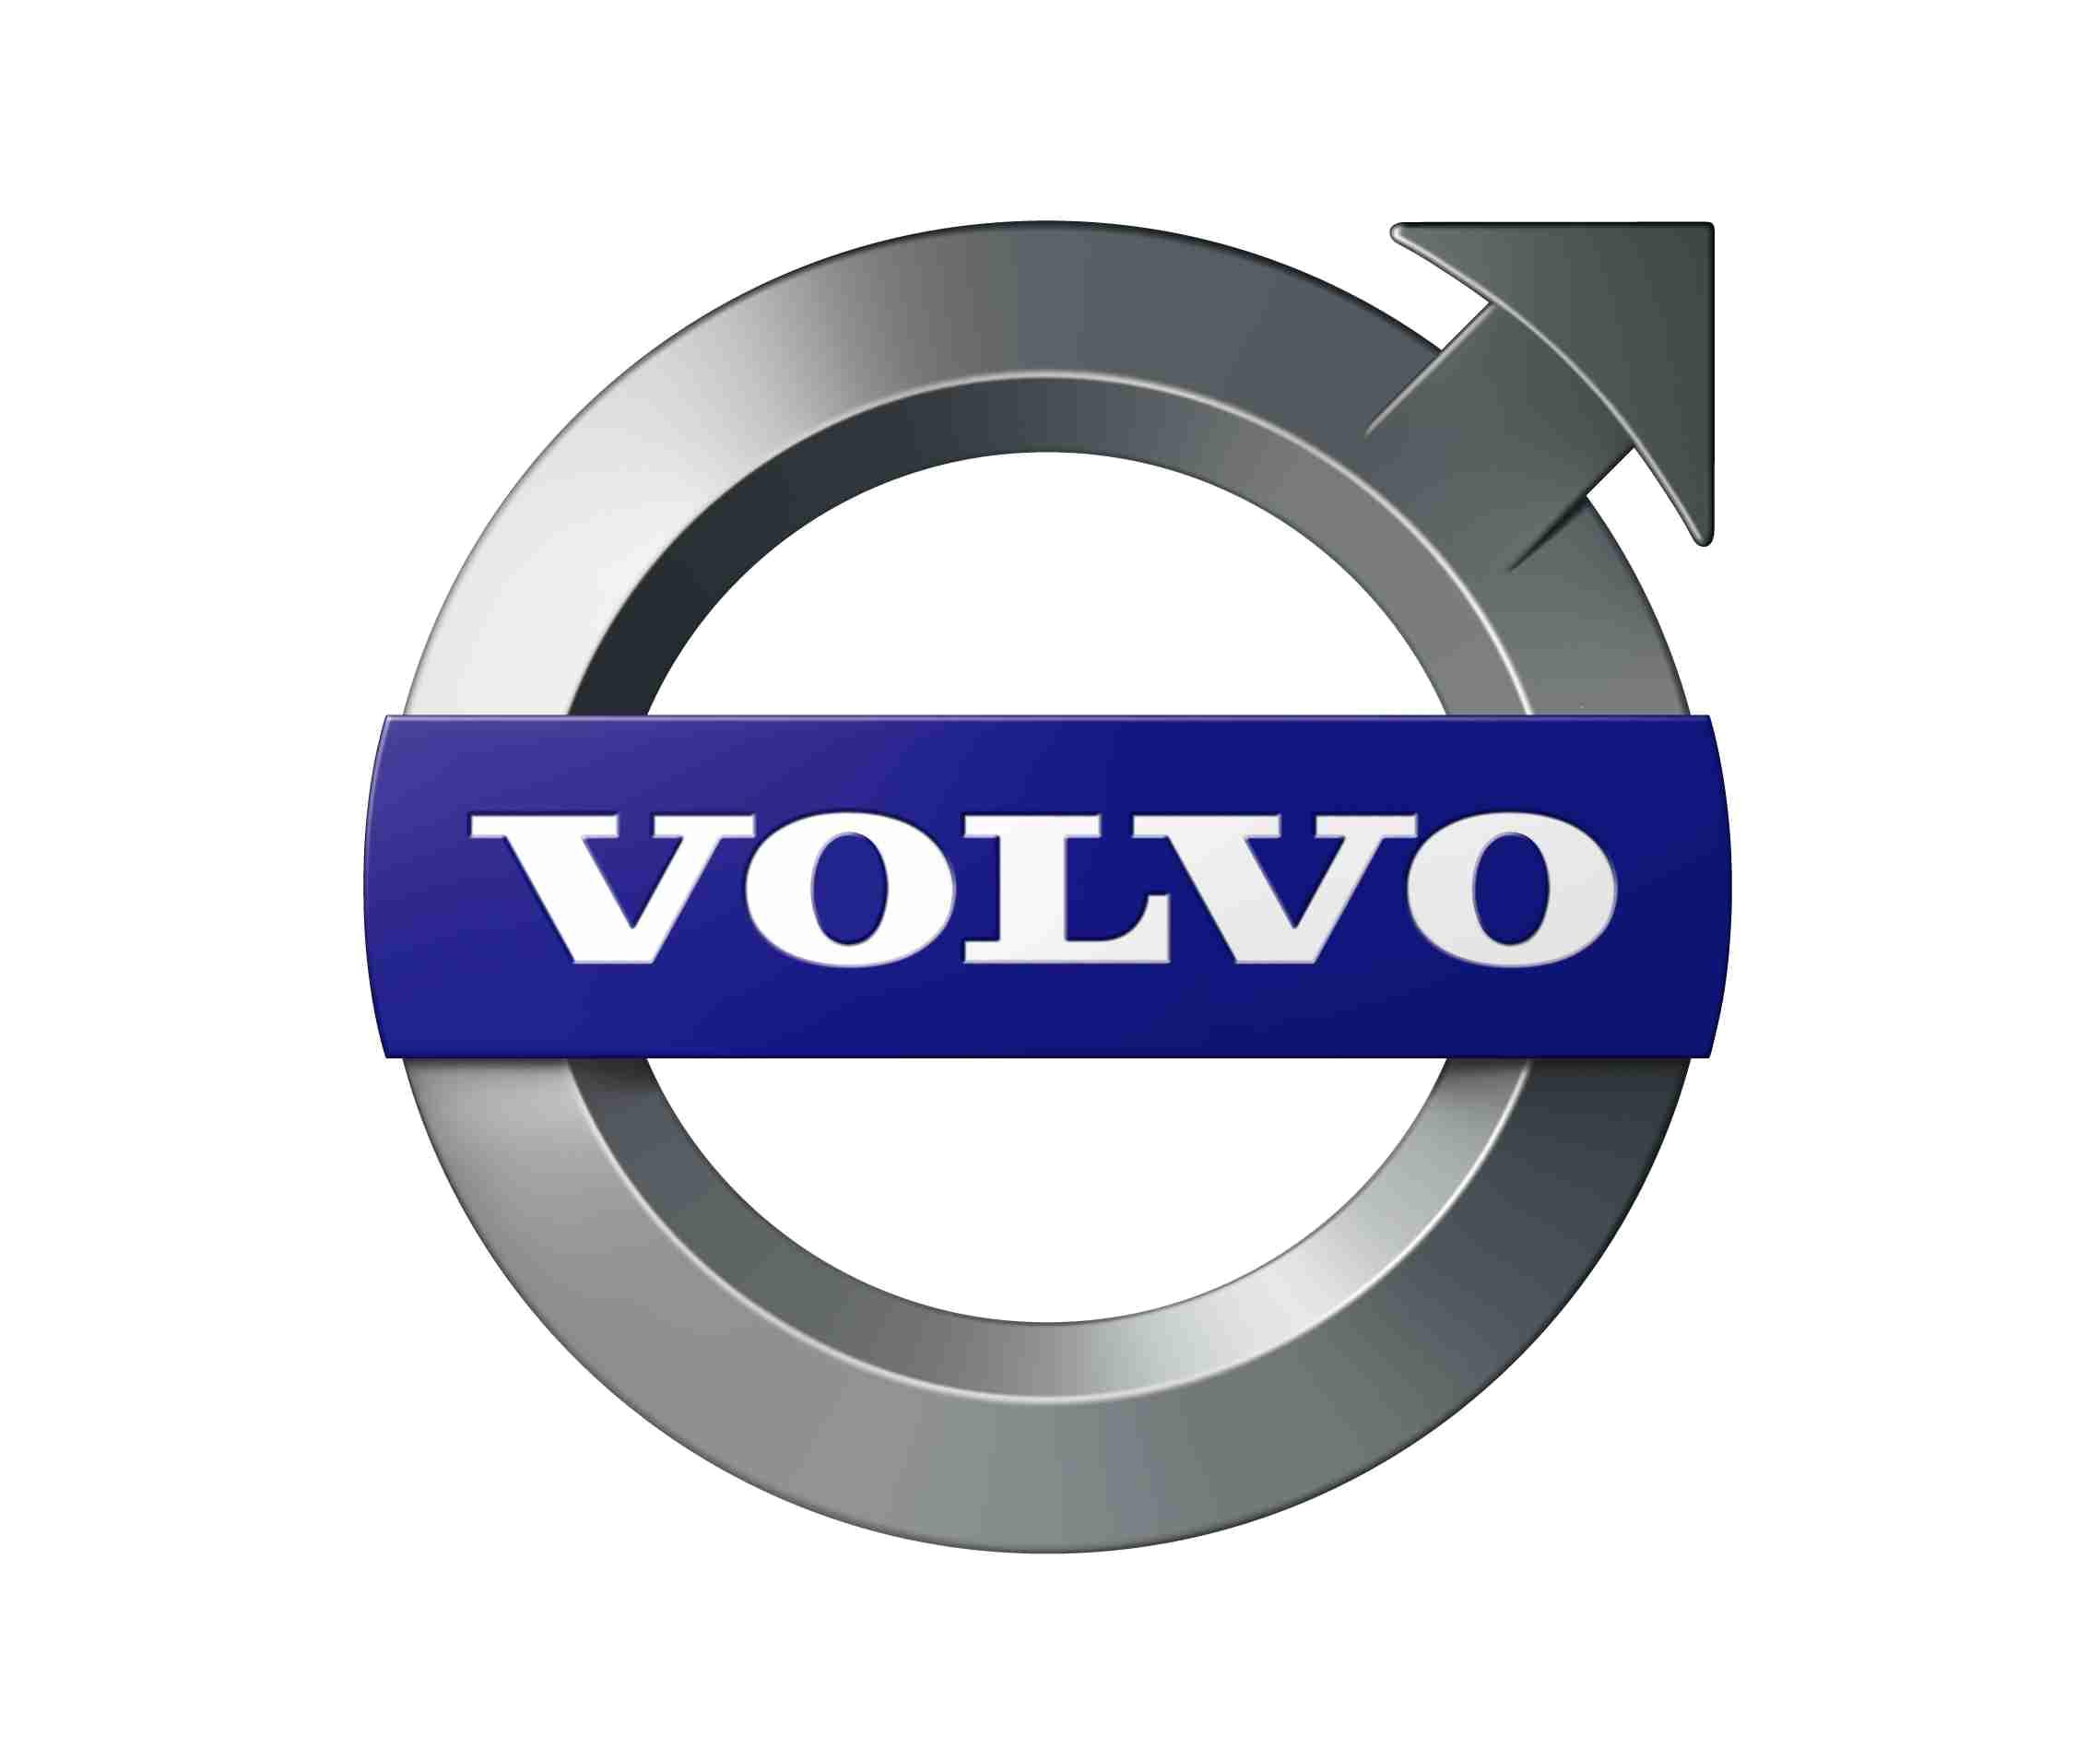 volvo_logo_PNG1668